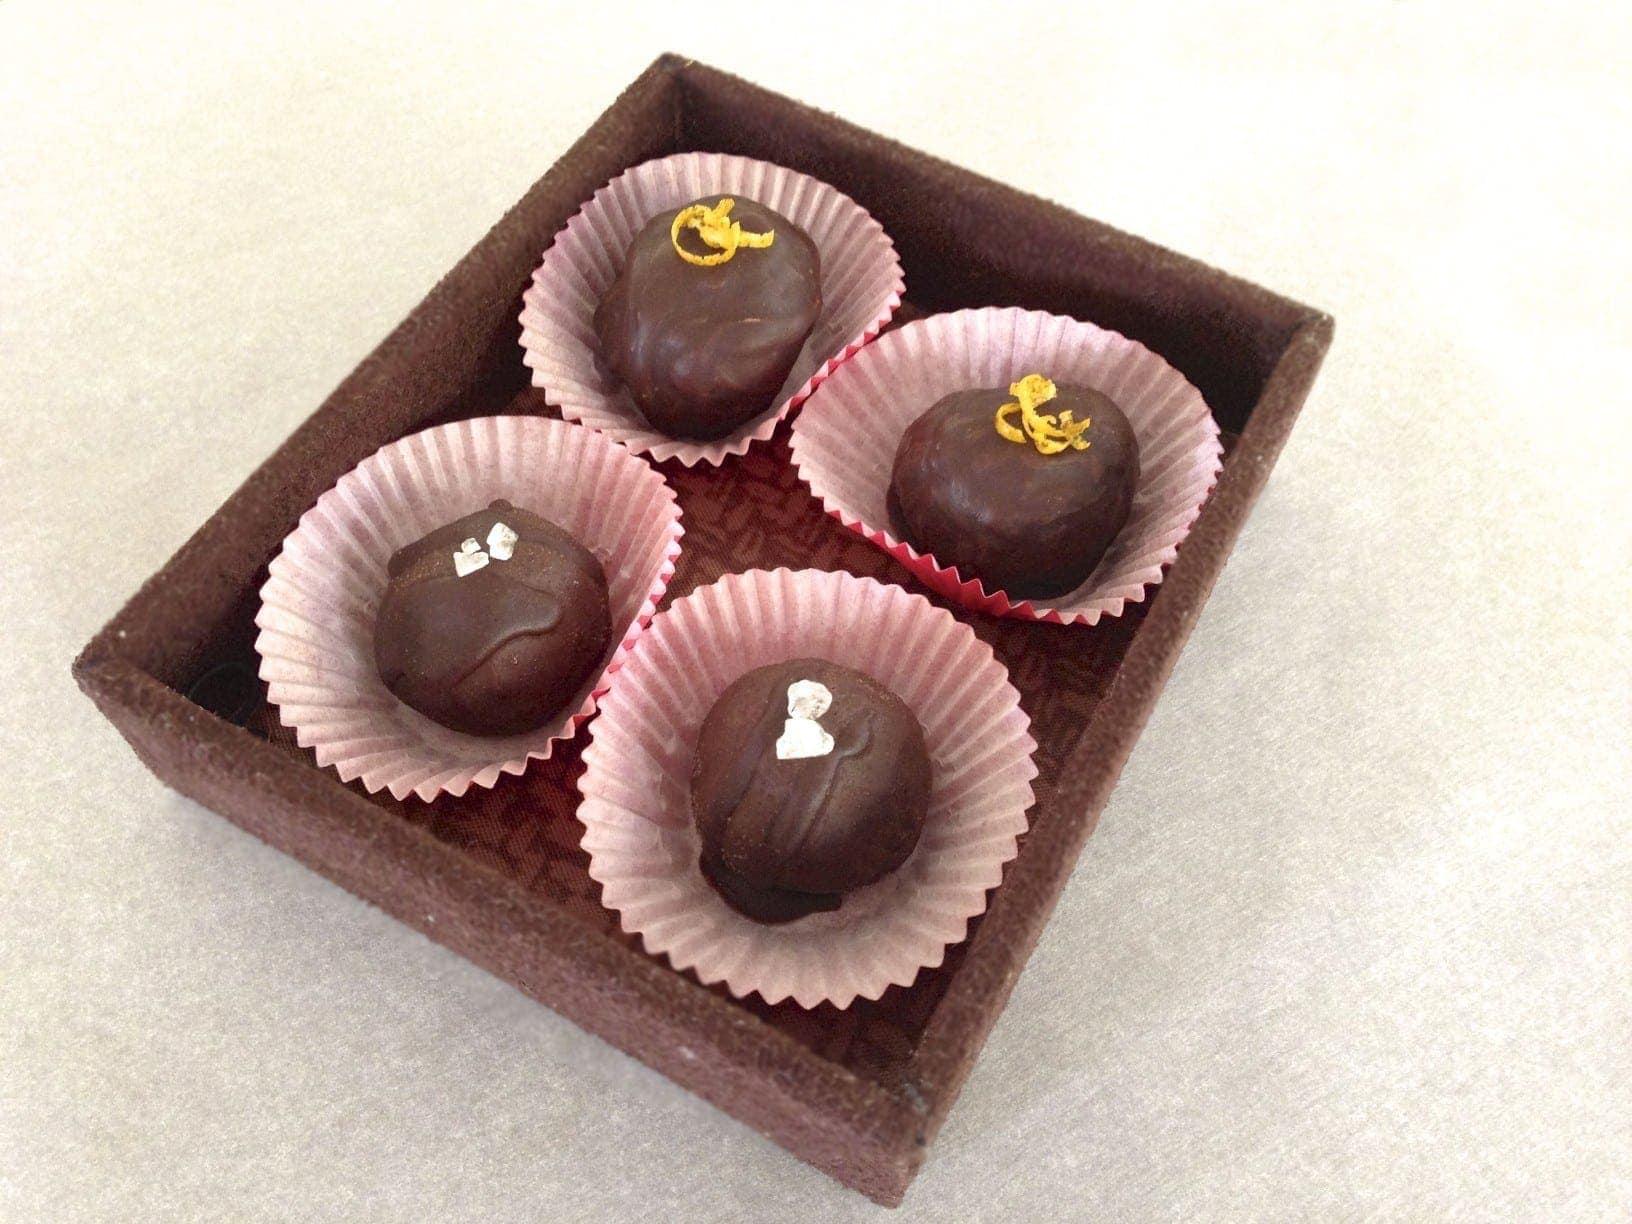 paleo chocolate truffle